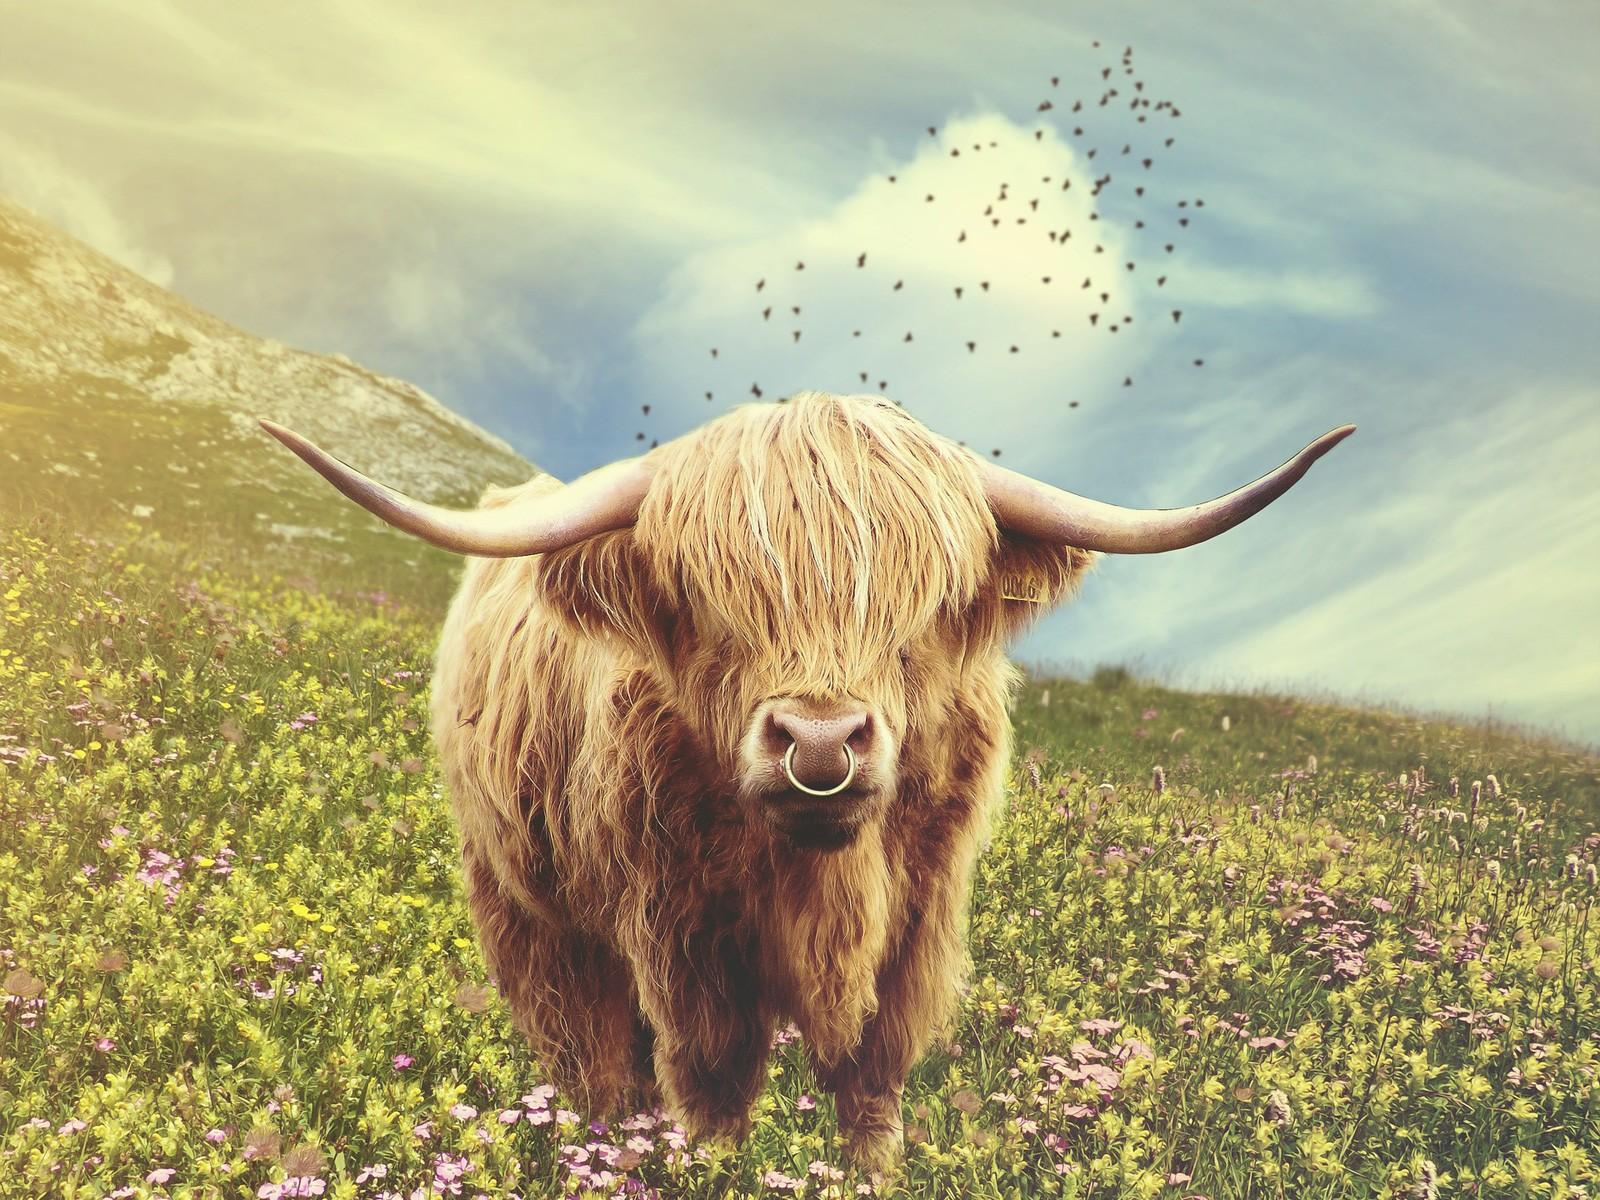 Woman is a bull-bull. characteristic